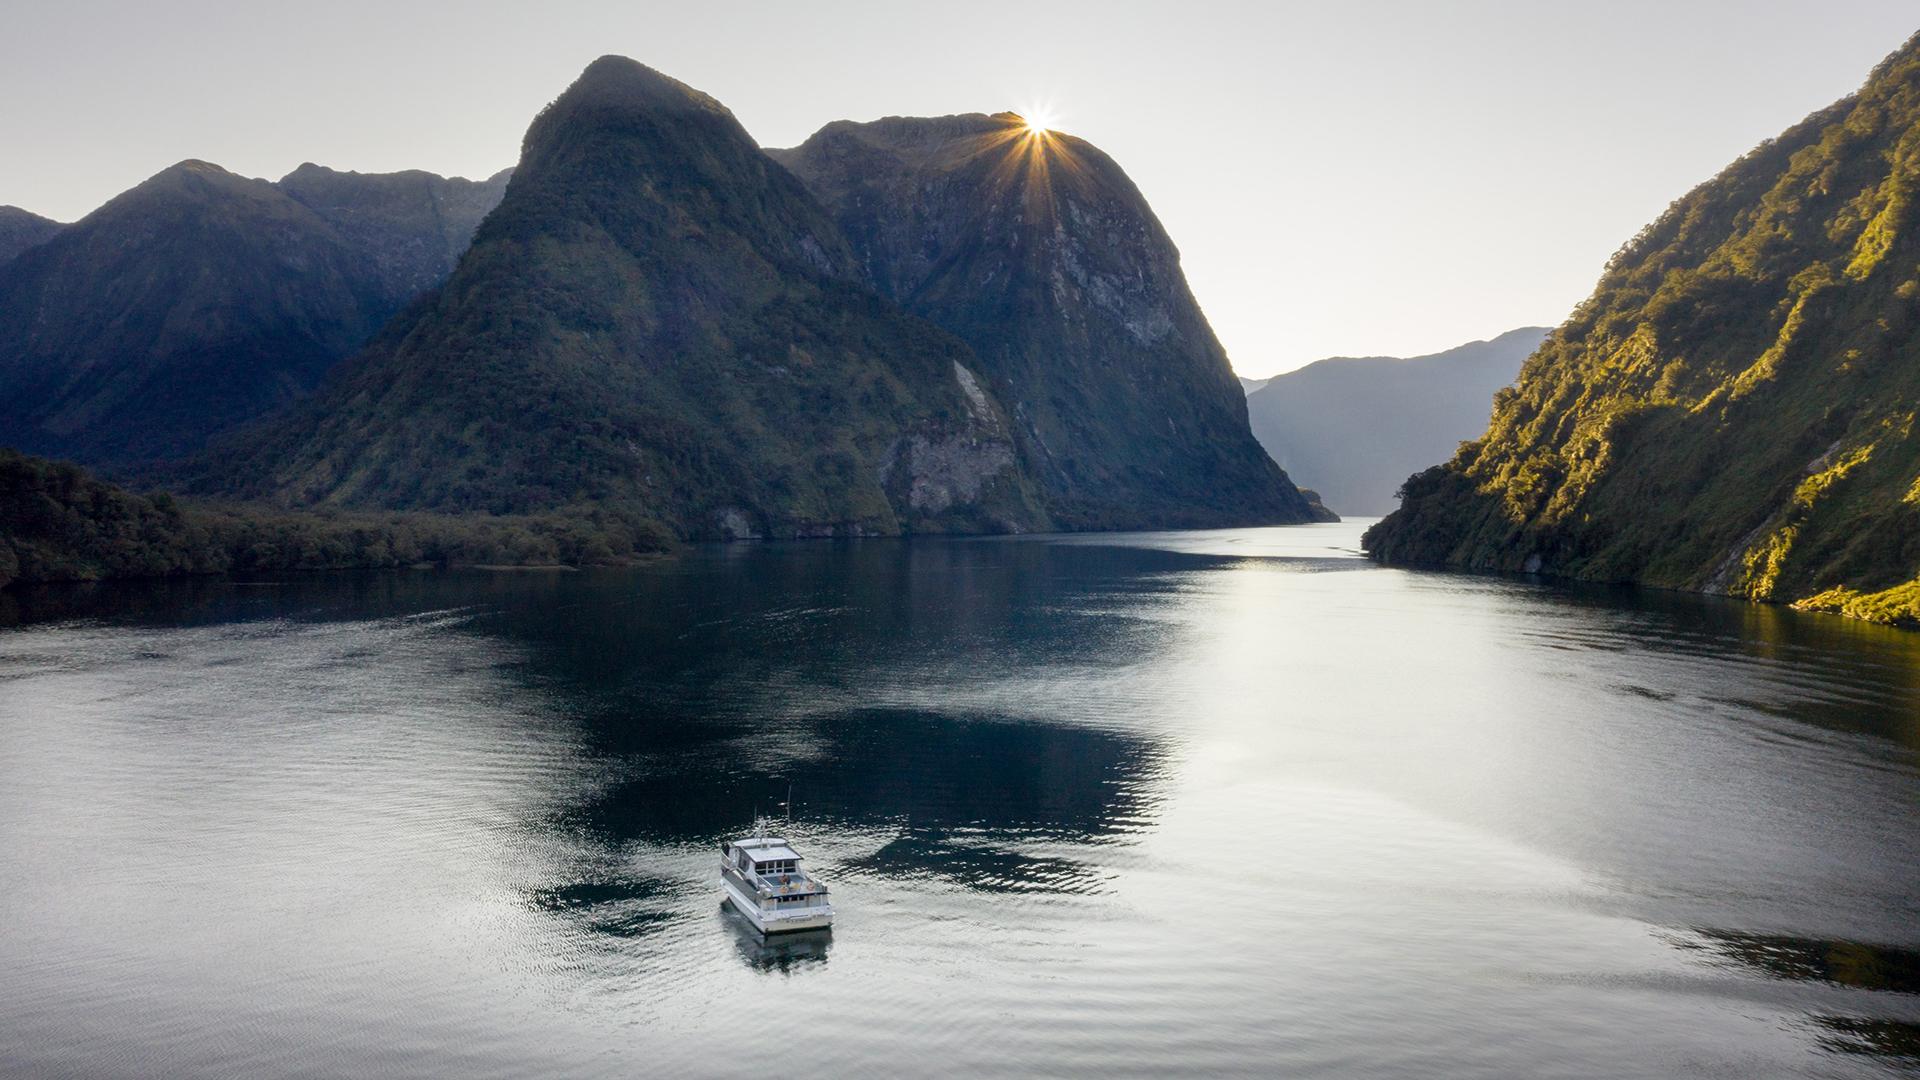 Doubtful Sound, Radfords on the Lake